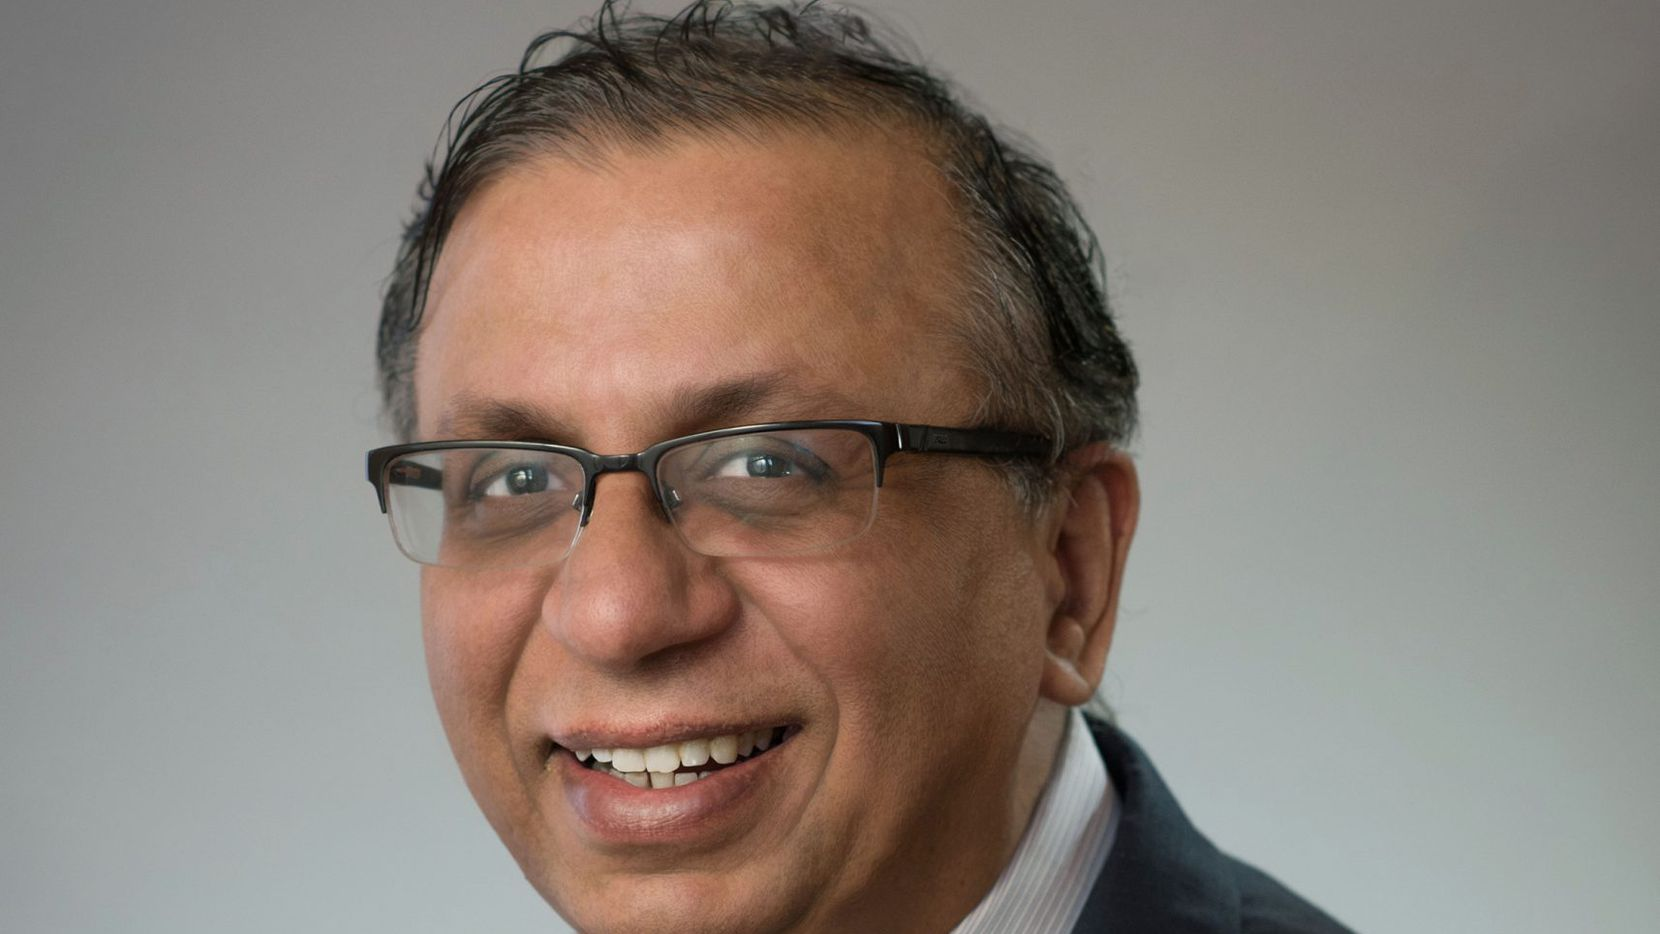 Mavenir CEO Pardeep Kohli